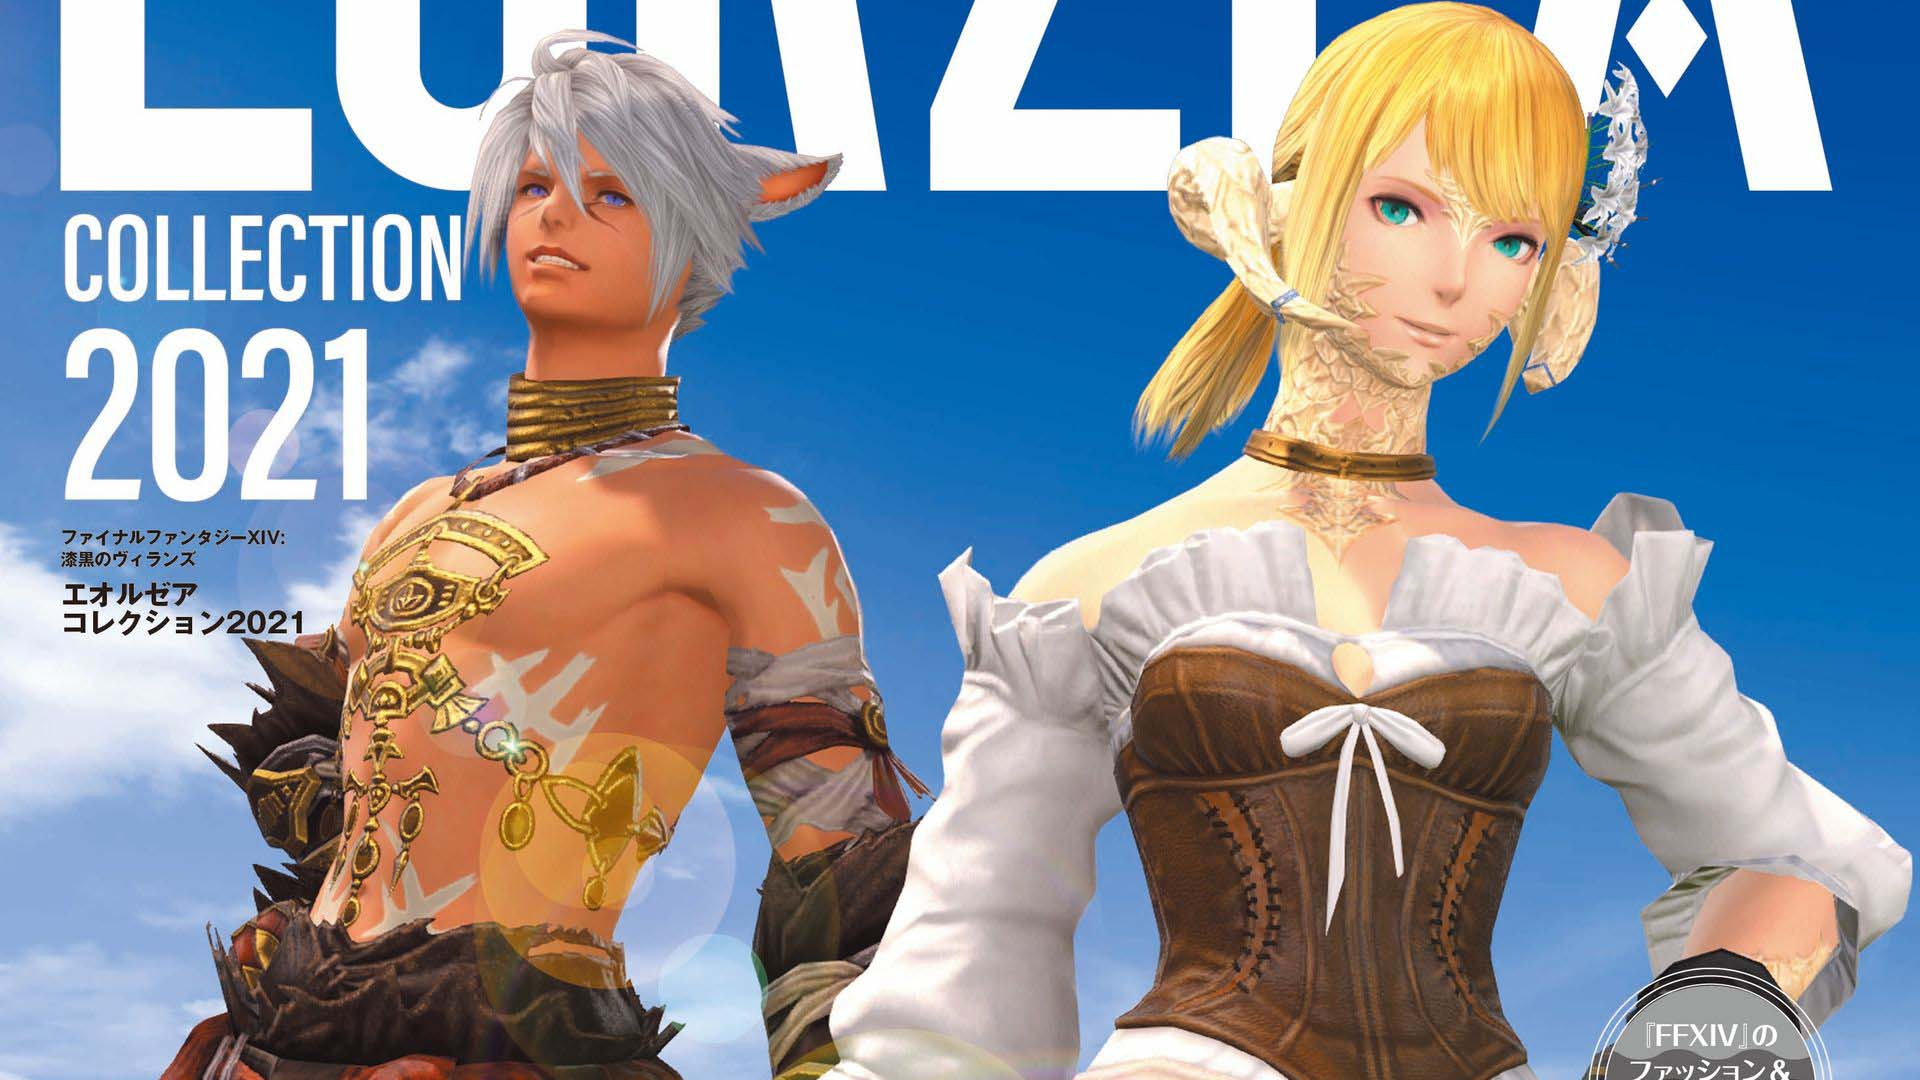 Final Fantasy XIV Eorzea Collection 2021